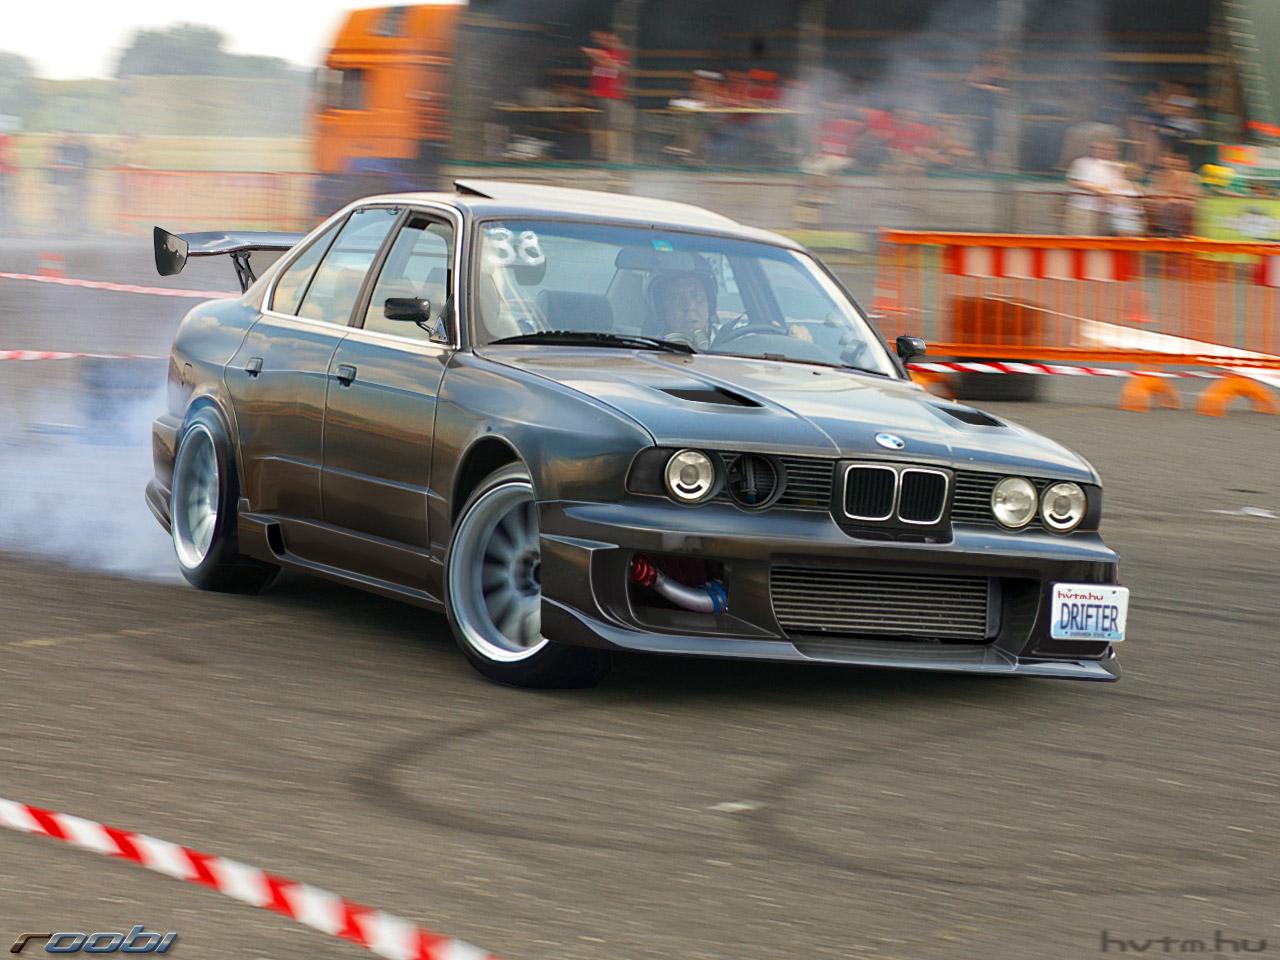 Bmw E34 Drift By Roobi On Deviantart